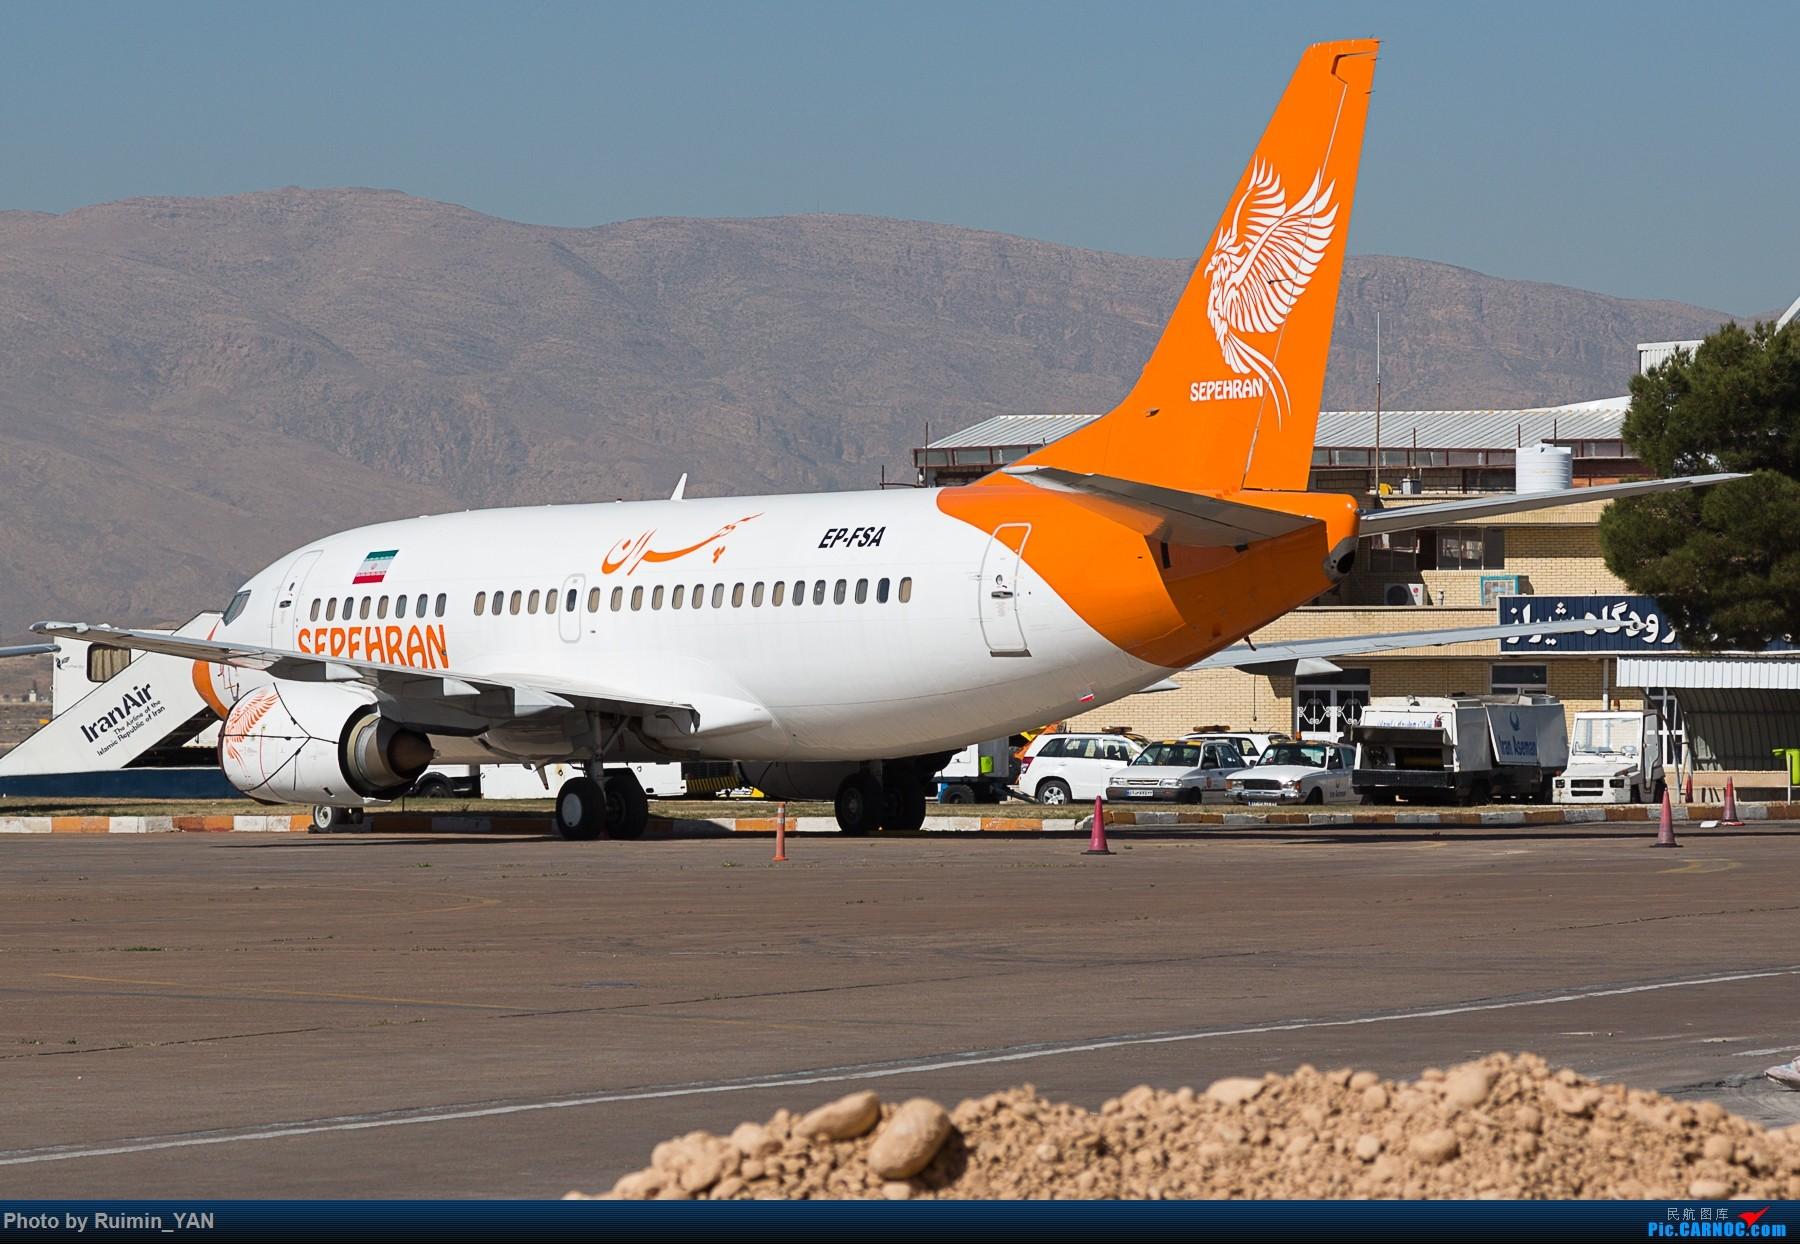 【SYZ】(伊朗设拉子)Sepehran航空 (Sepehran Airlines, SHI) B735 BOEING 737-500 EP-FSA 设拉子国际机场